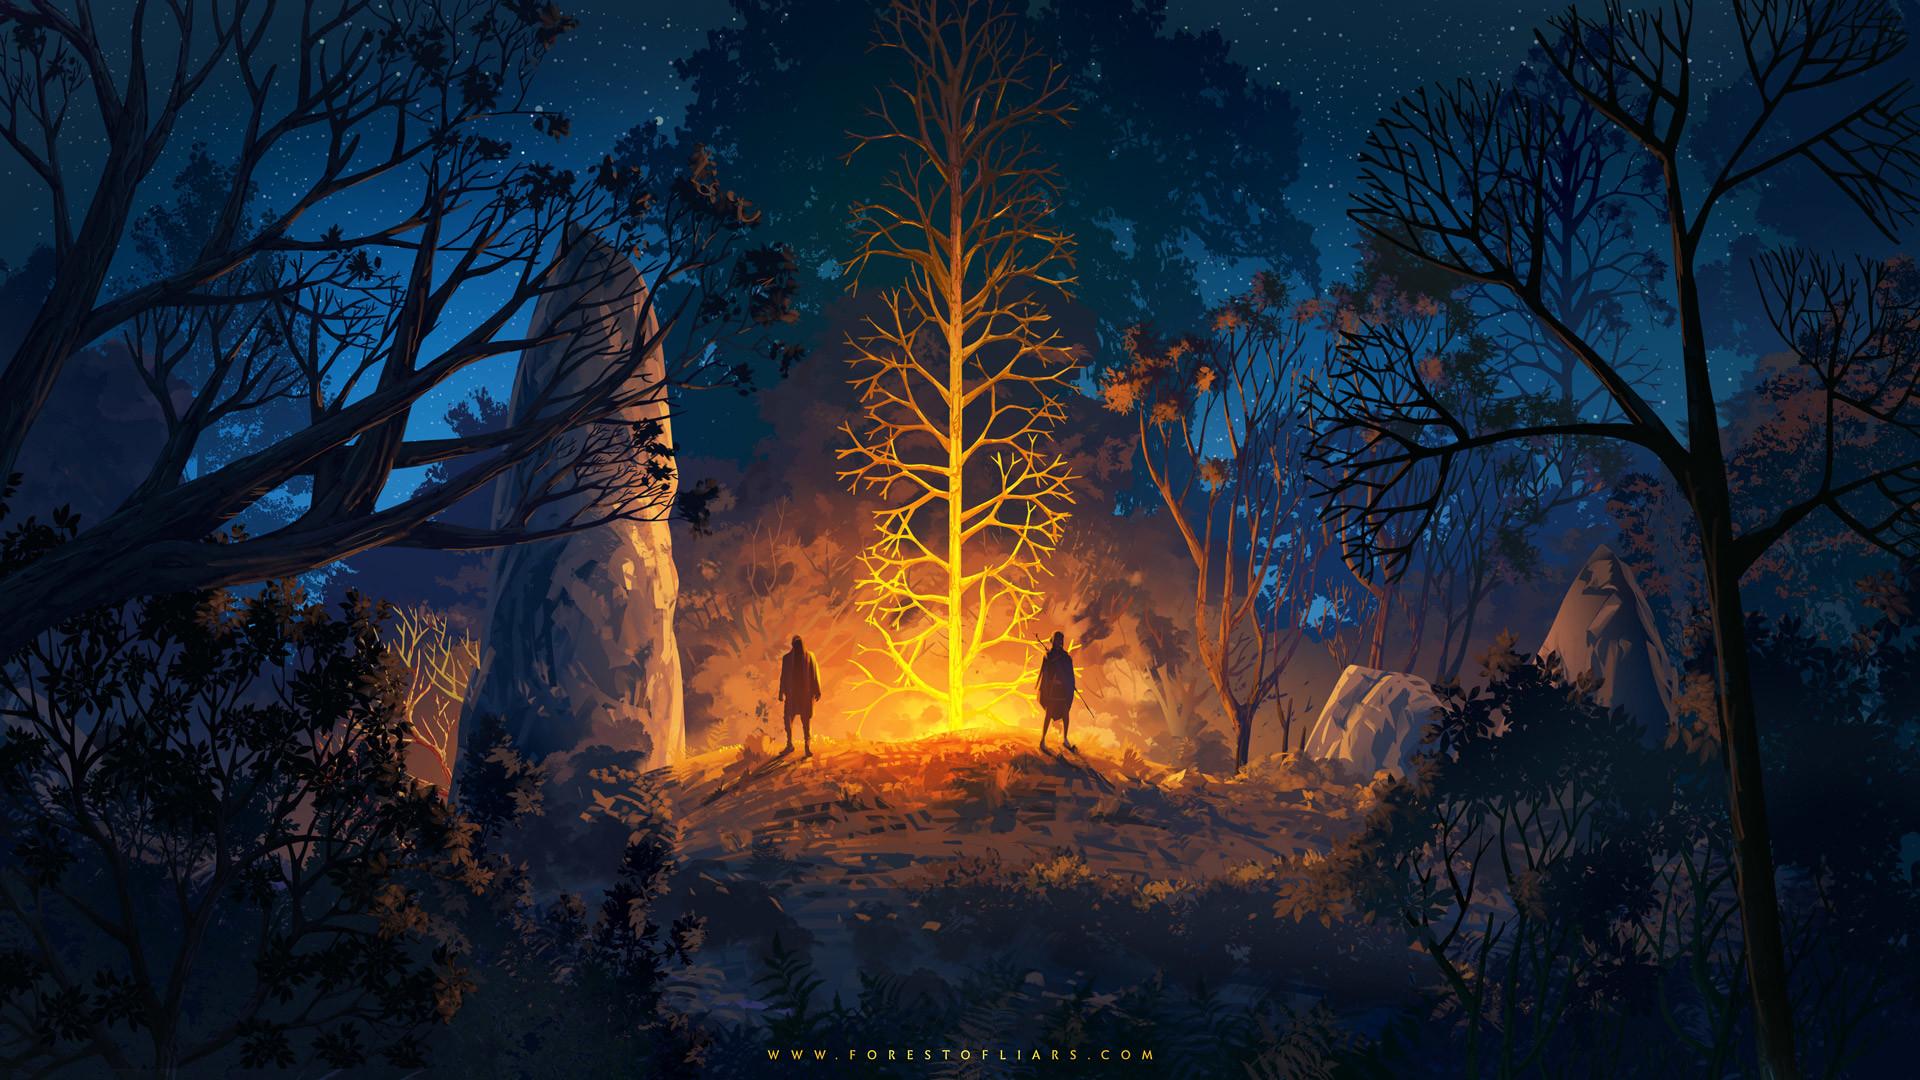 General 1920x1080 Sylvain Sarrailh Forest of Liars trees night stars artwork video game art digital art rocks